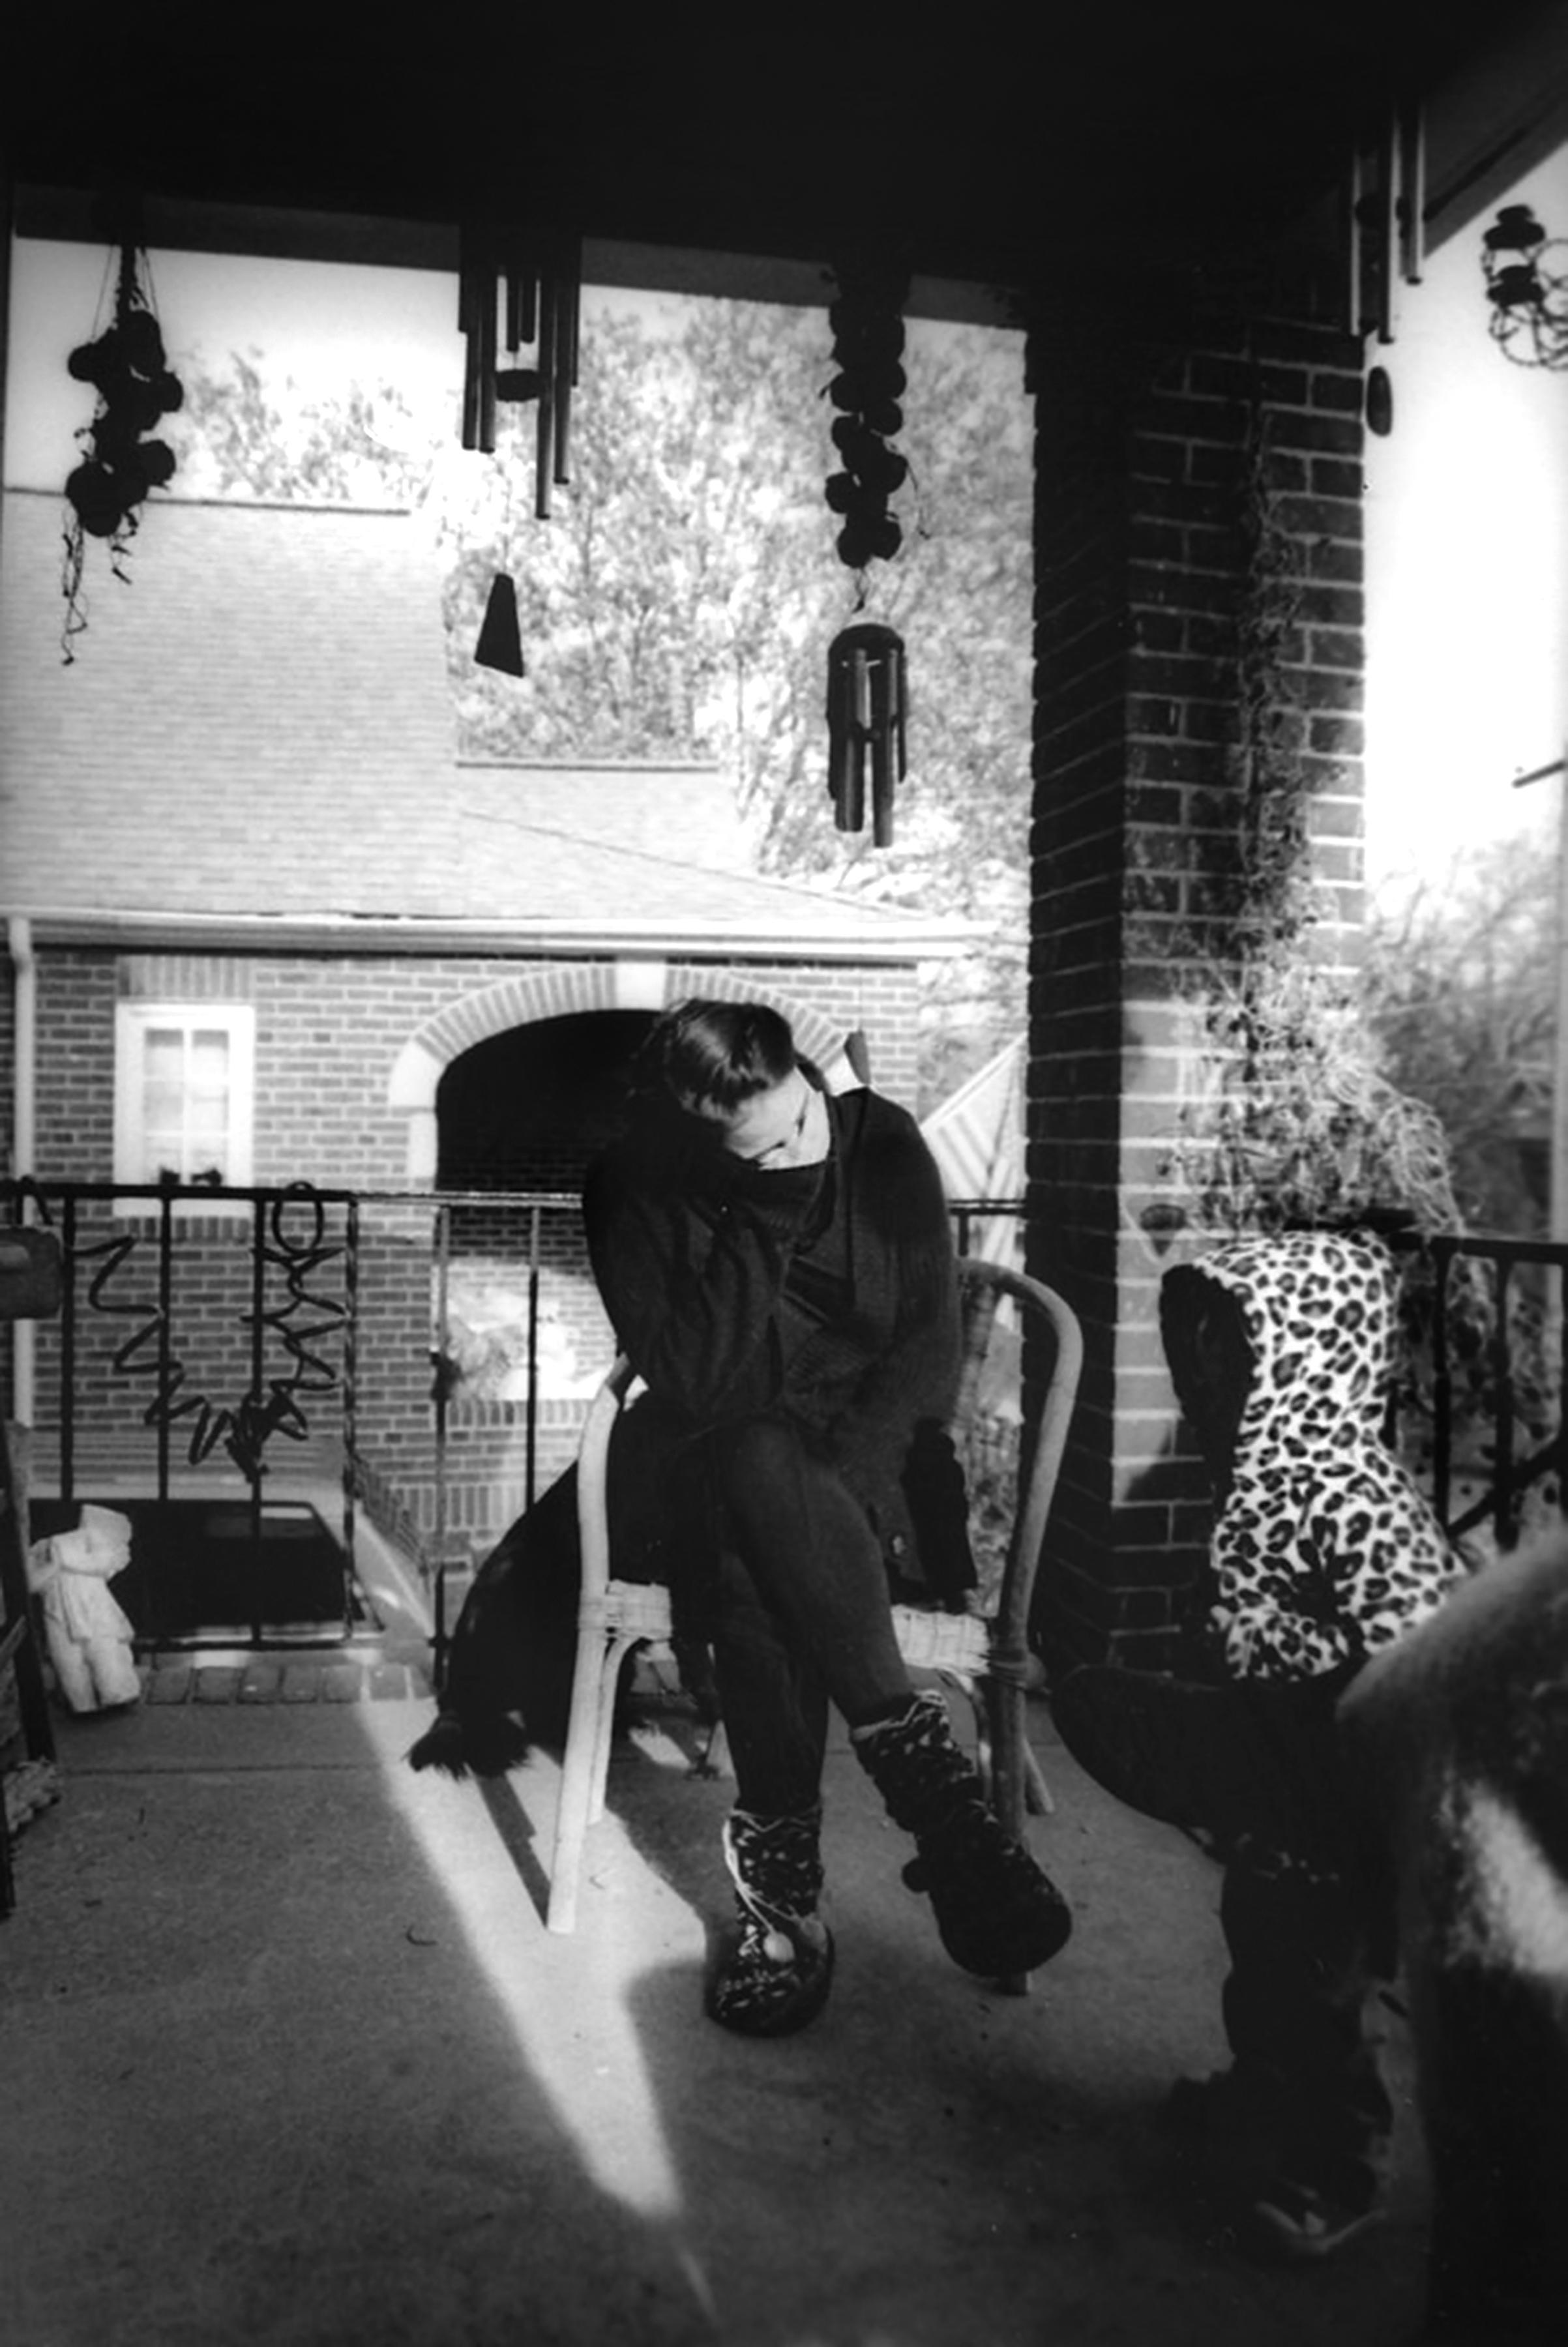 Gatewood_Audrey_Lexei_on_the_Porch.jpg